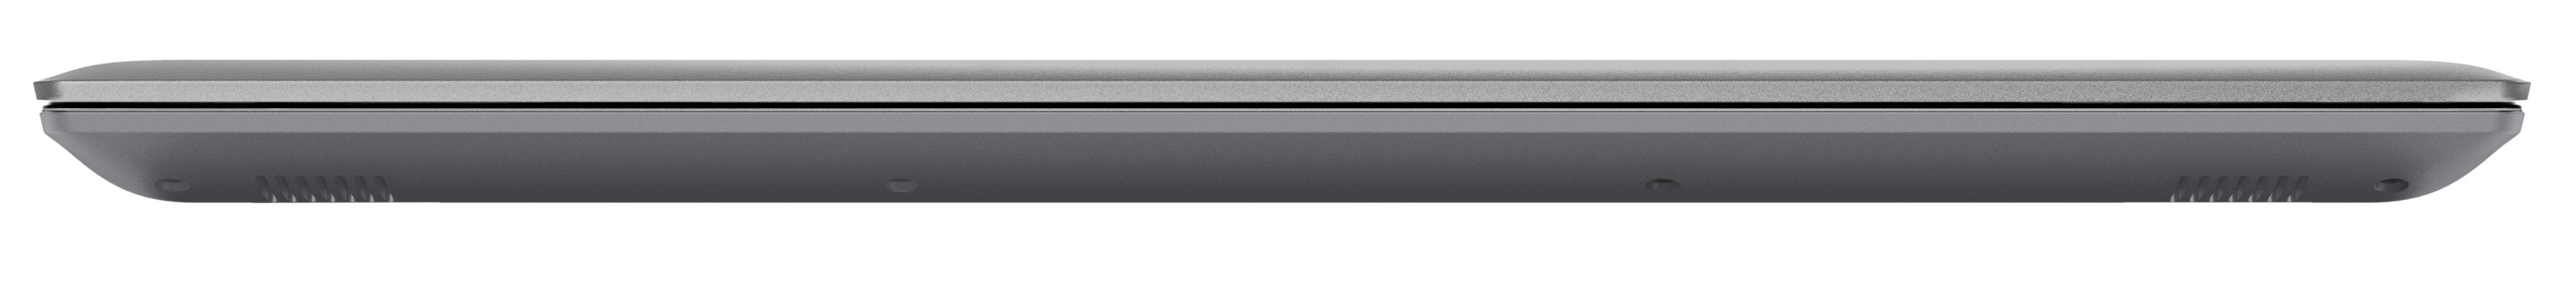 Фото  Ноутбук Lenovo ideapad 320-15IKB Platinum Grey (80XL00KPRU)